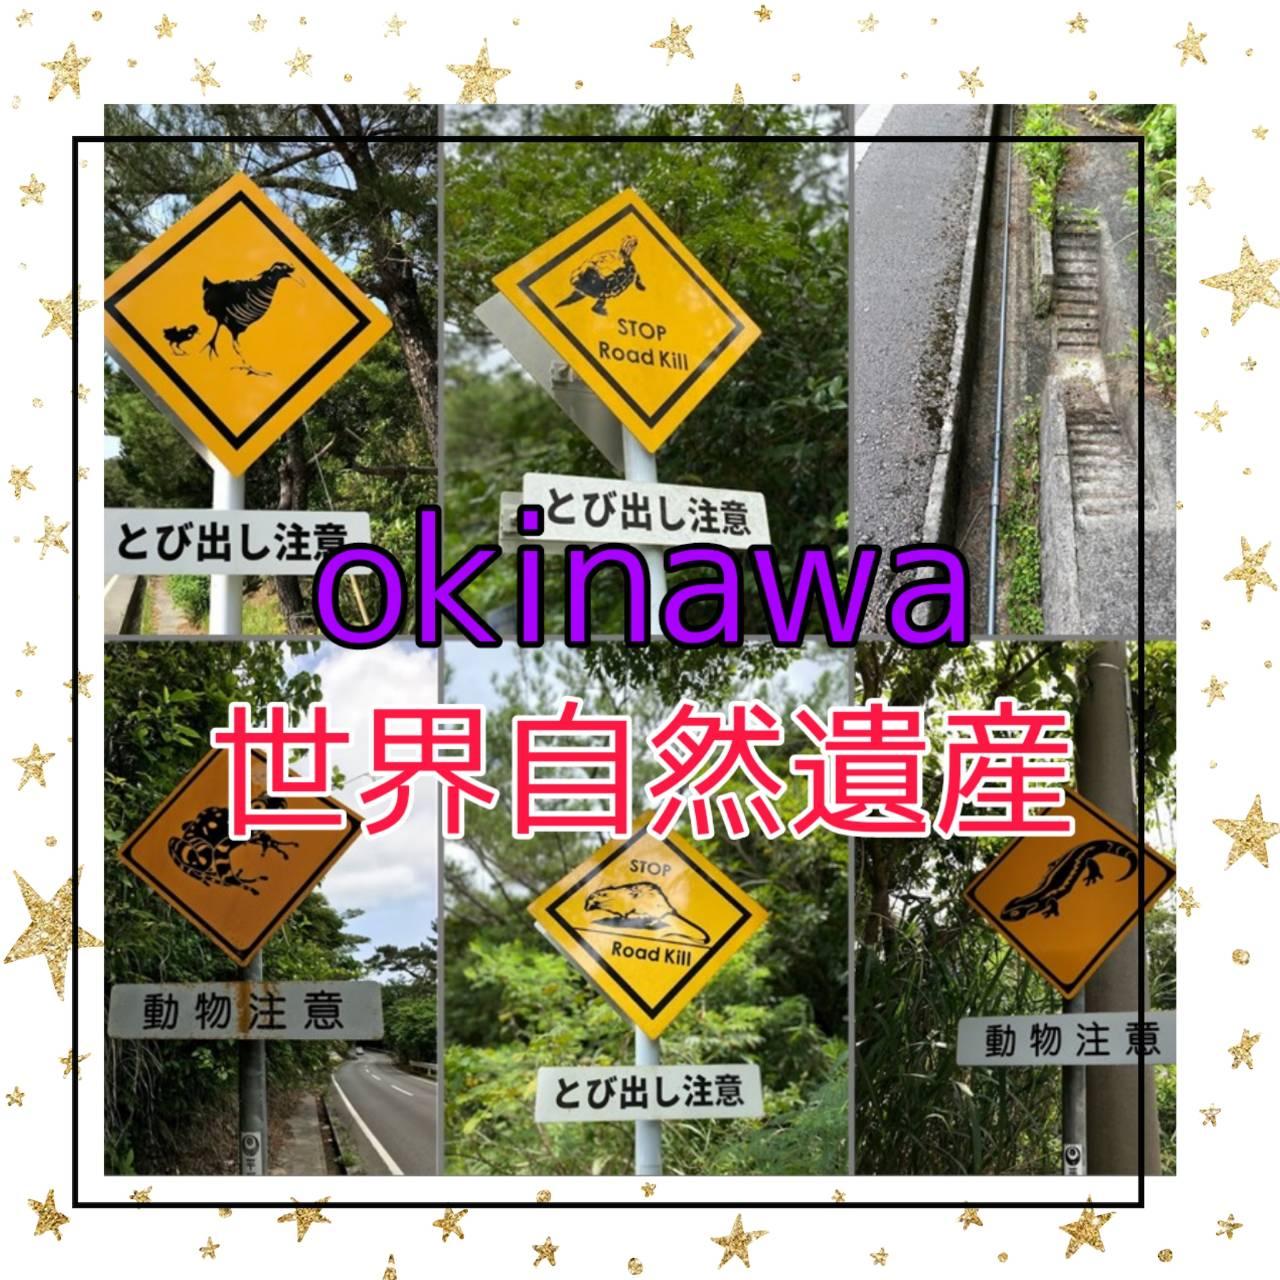 【PRチームおすすめ情報②】世界遺産・珍しい動物標識!